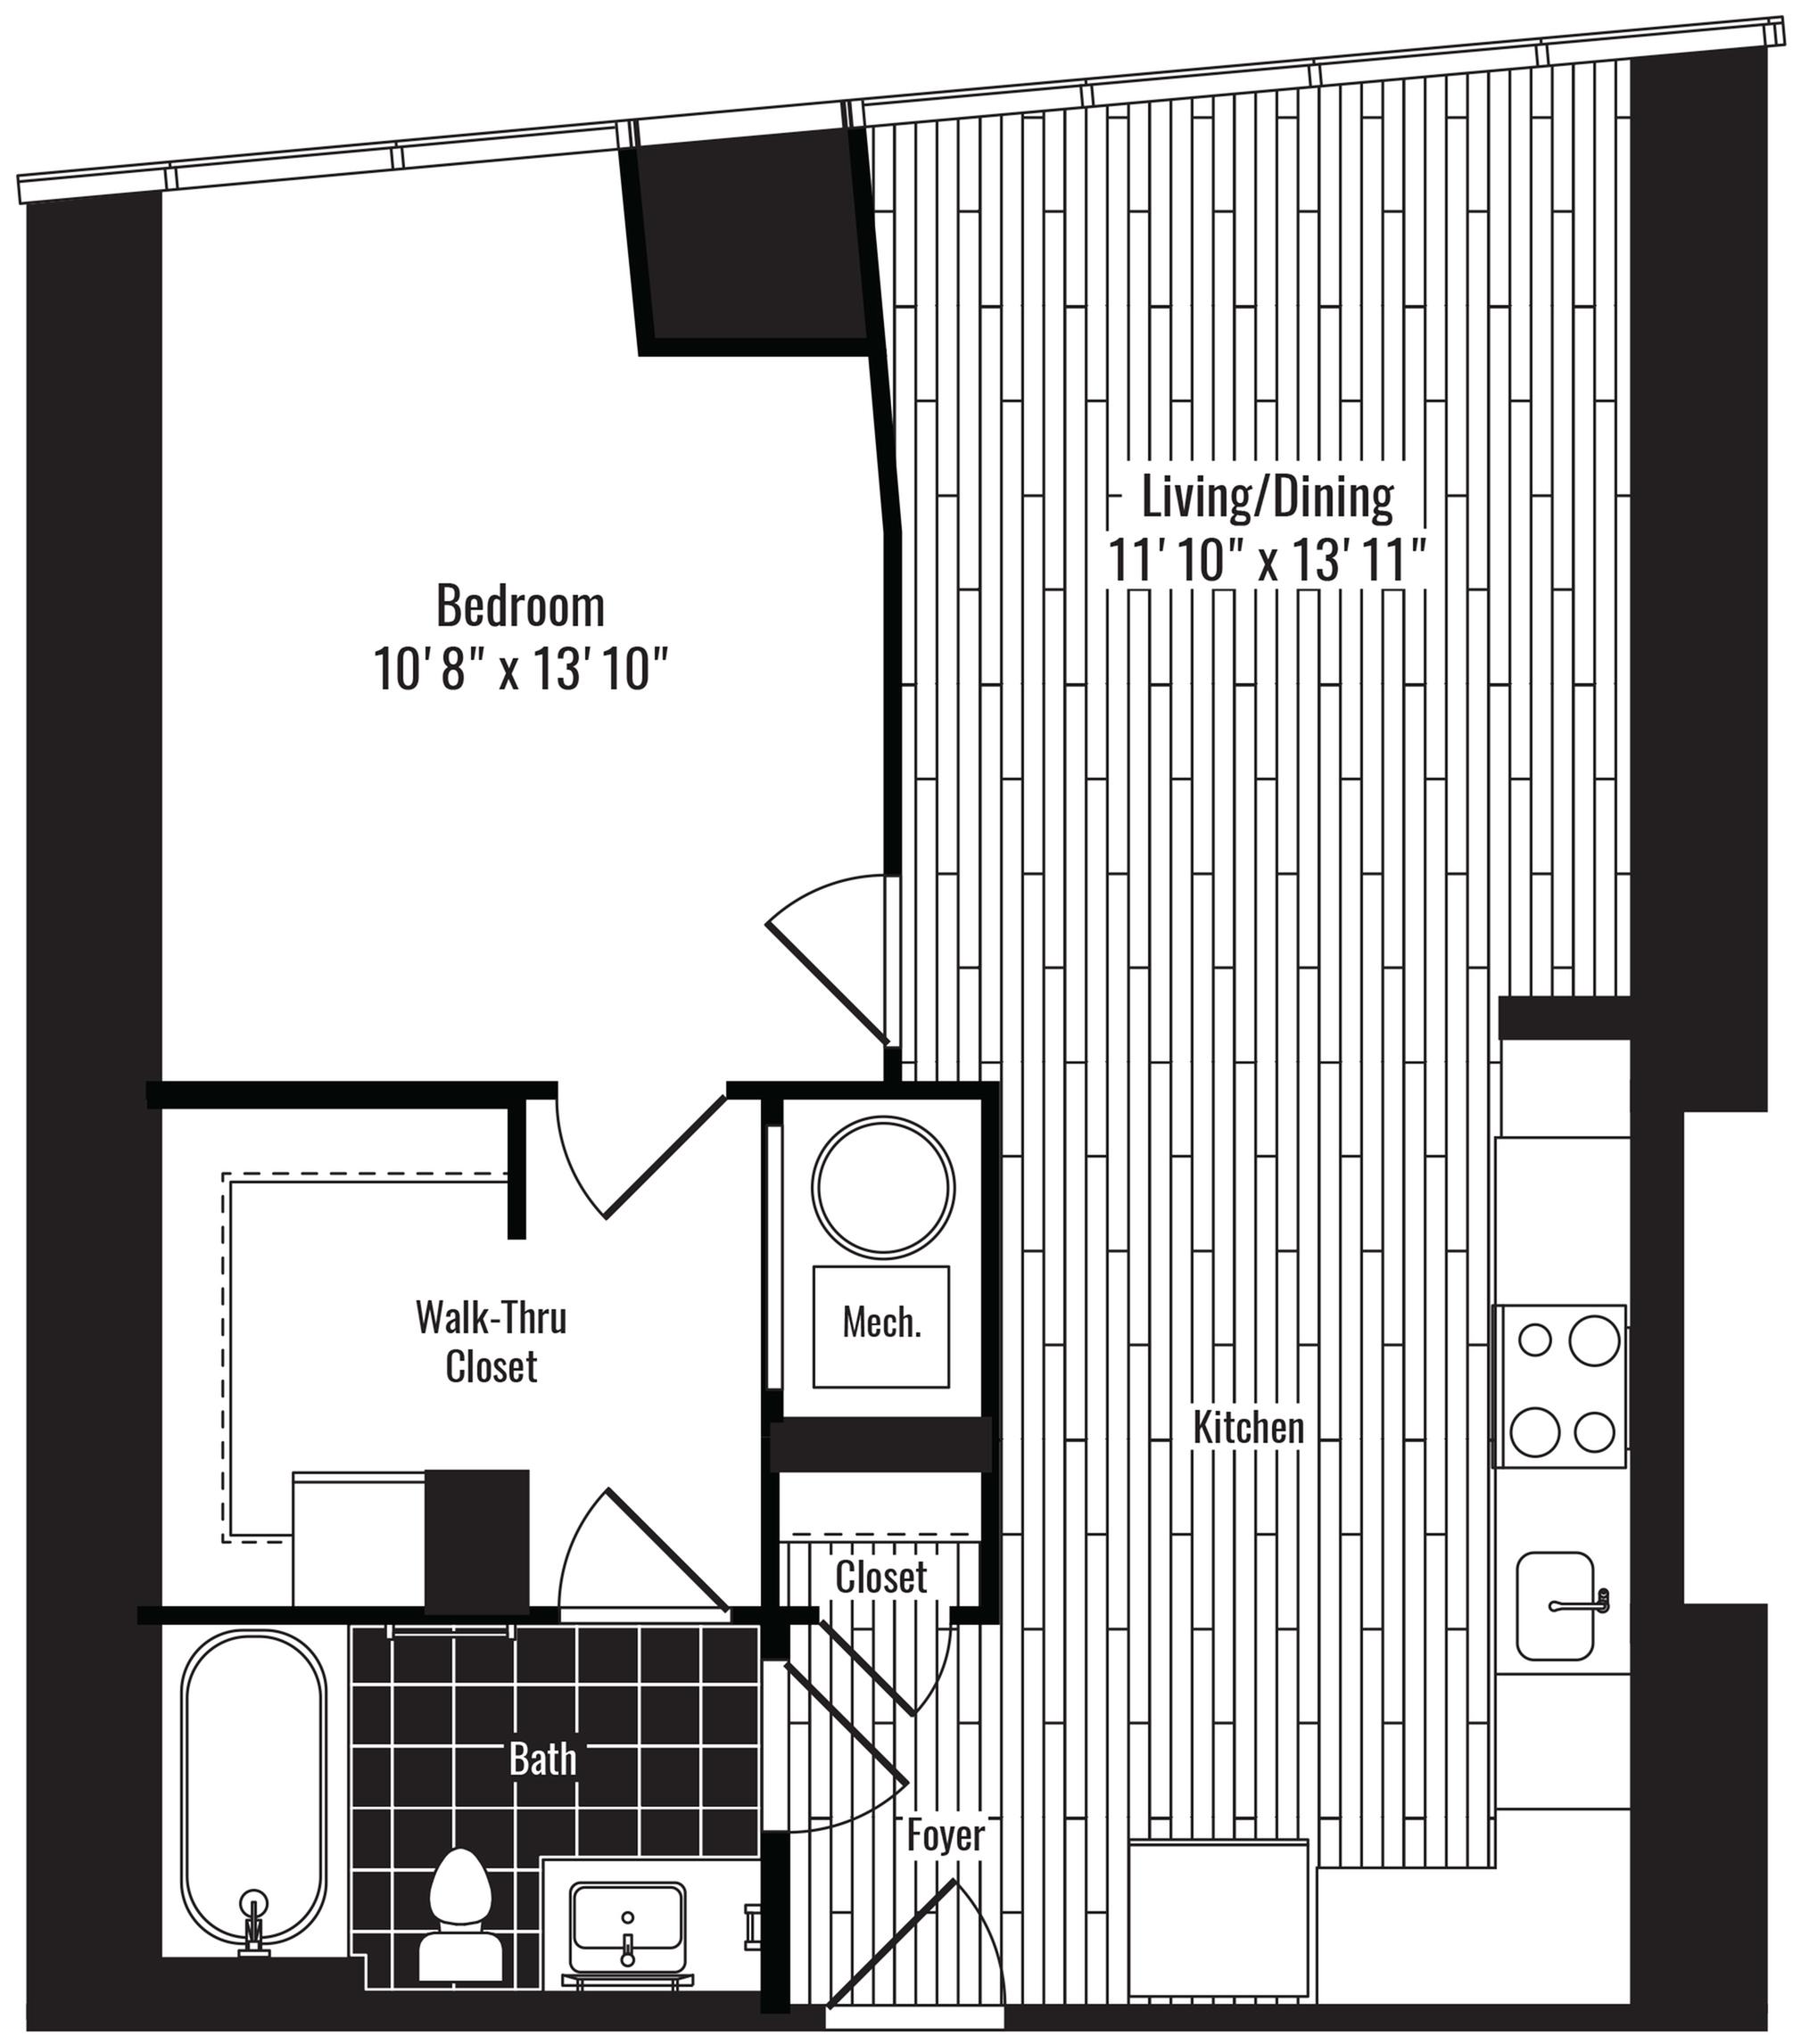 688 square foot one bedroom one bath apartment floorplan image